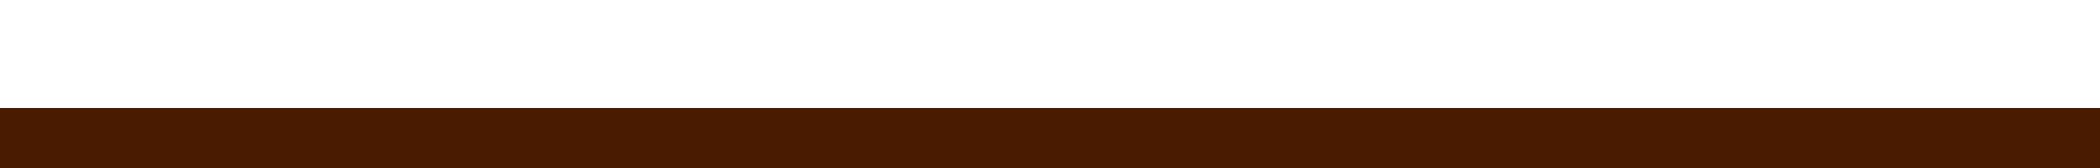 back01-boulangerielouveigne